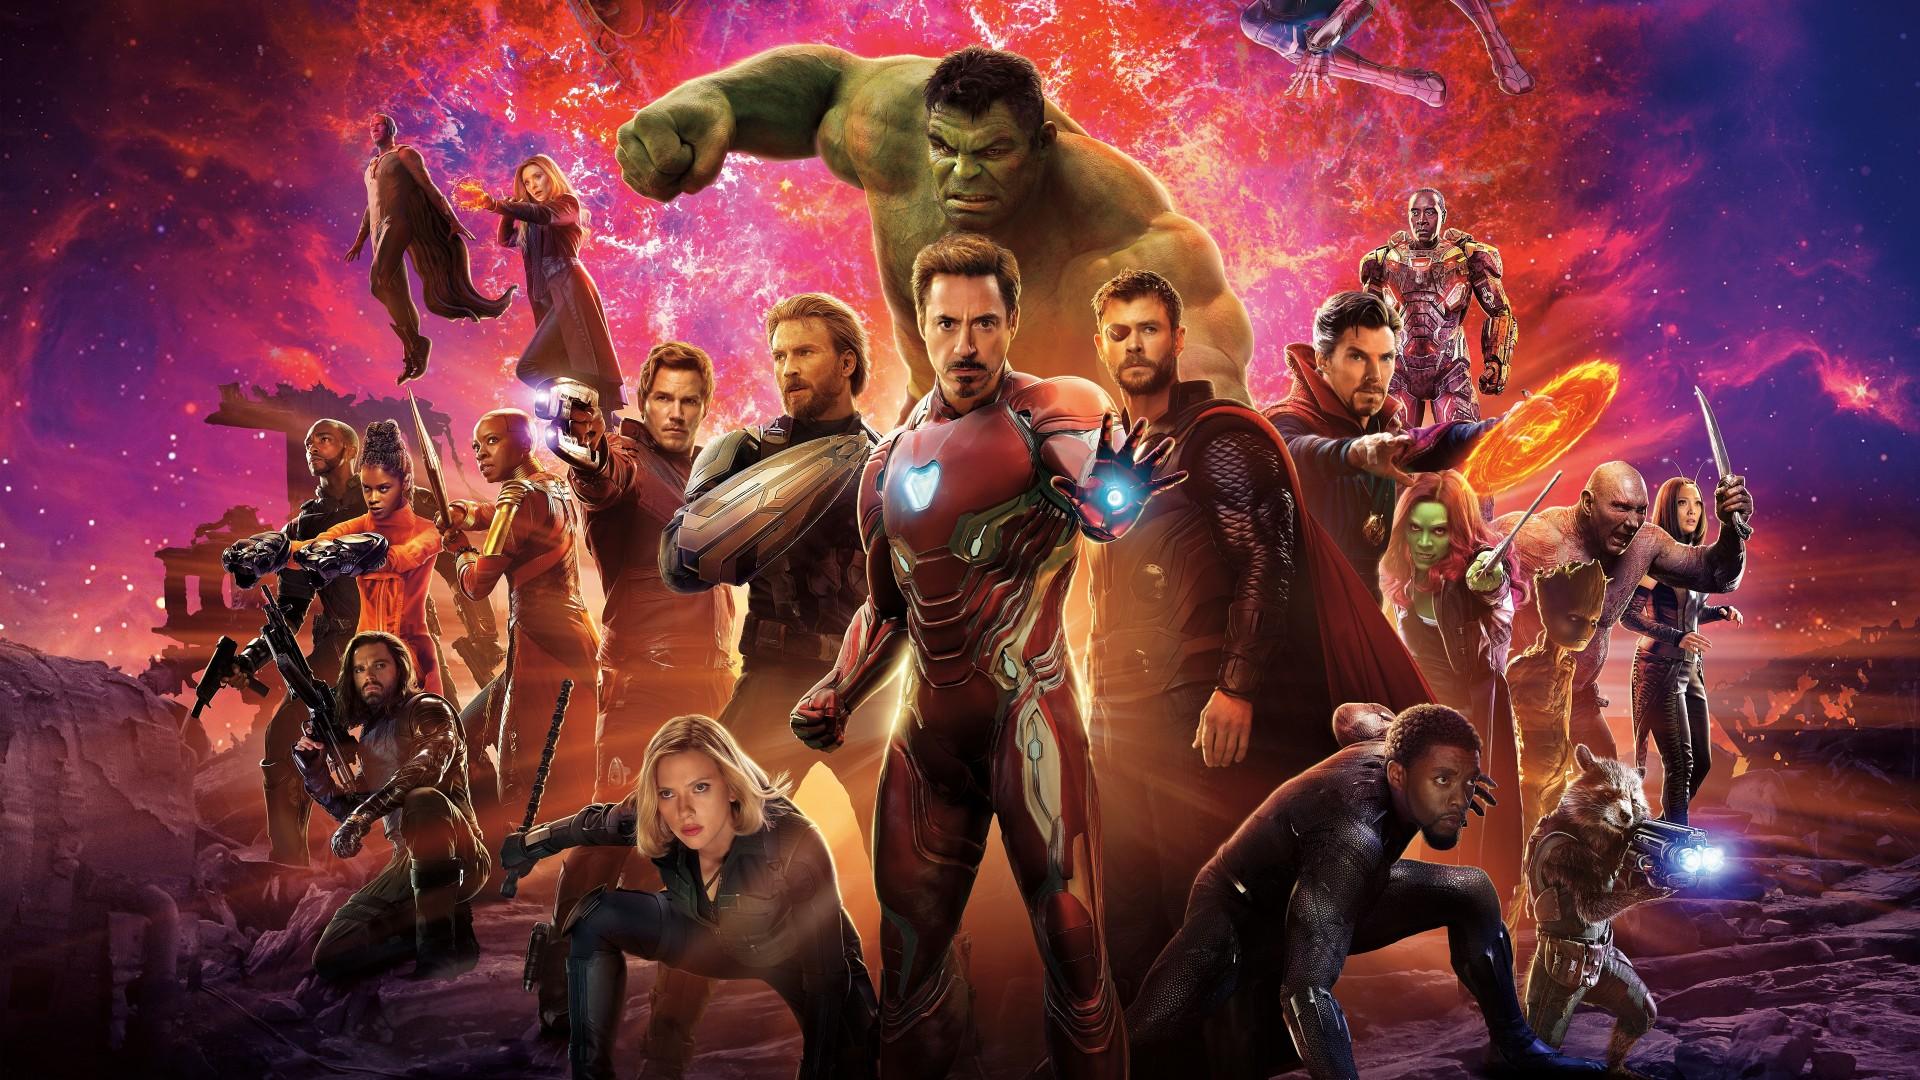 Cars 2 Wallpaper For Windows 7 Avengers Infinity War 2018 4k 8k Wallpapers Hd